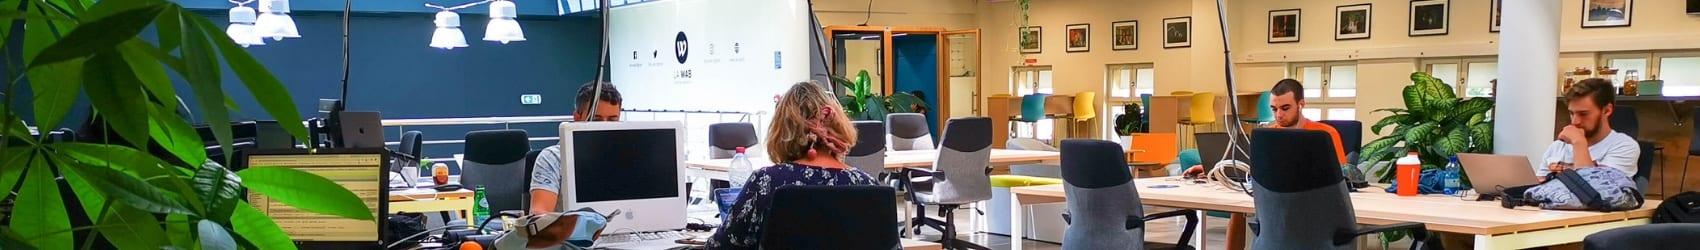 le-taf-cafe-espace-coworking-de-la-wab.jpg